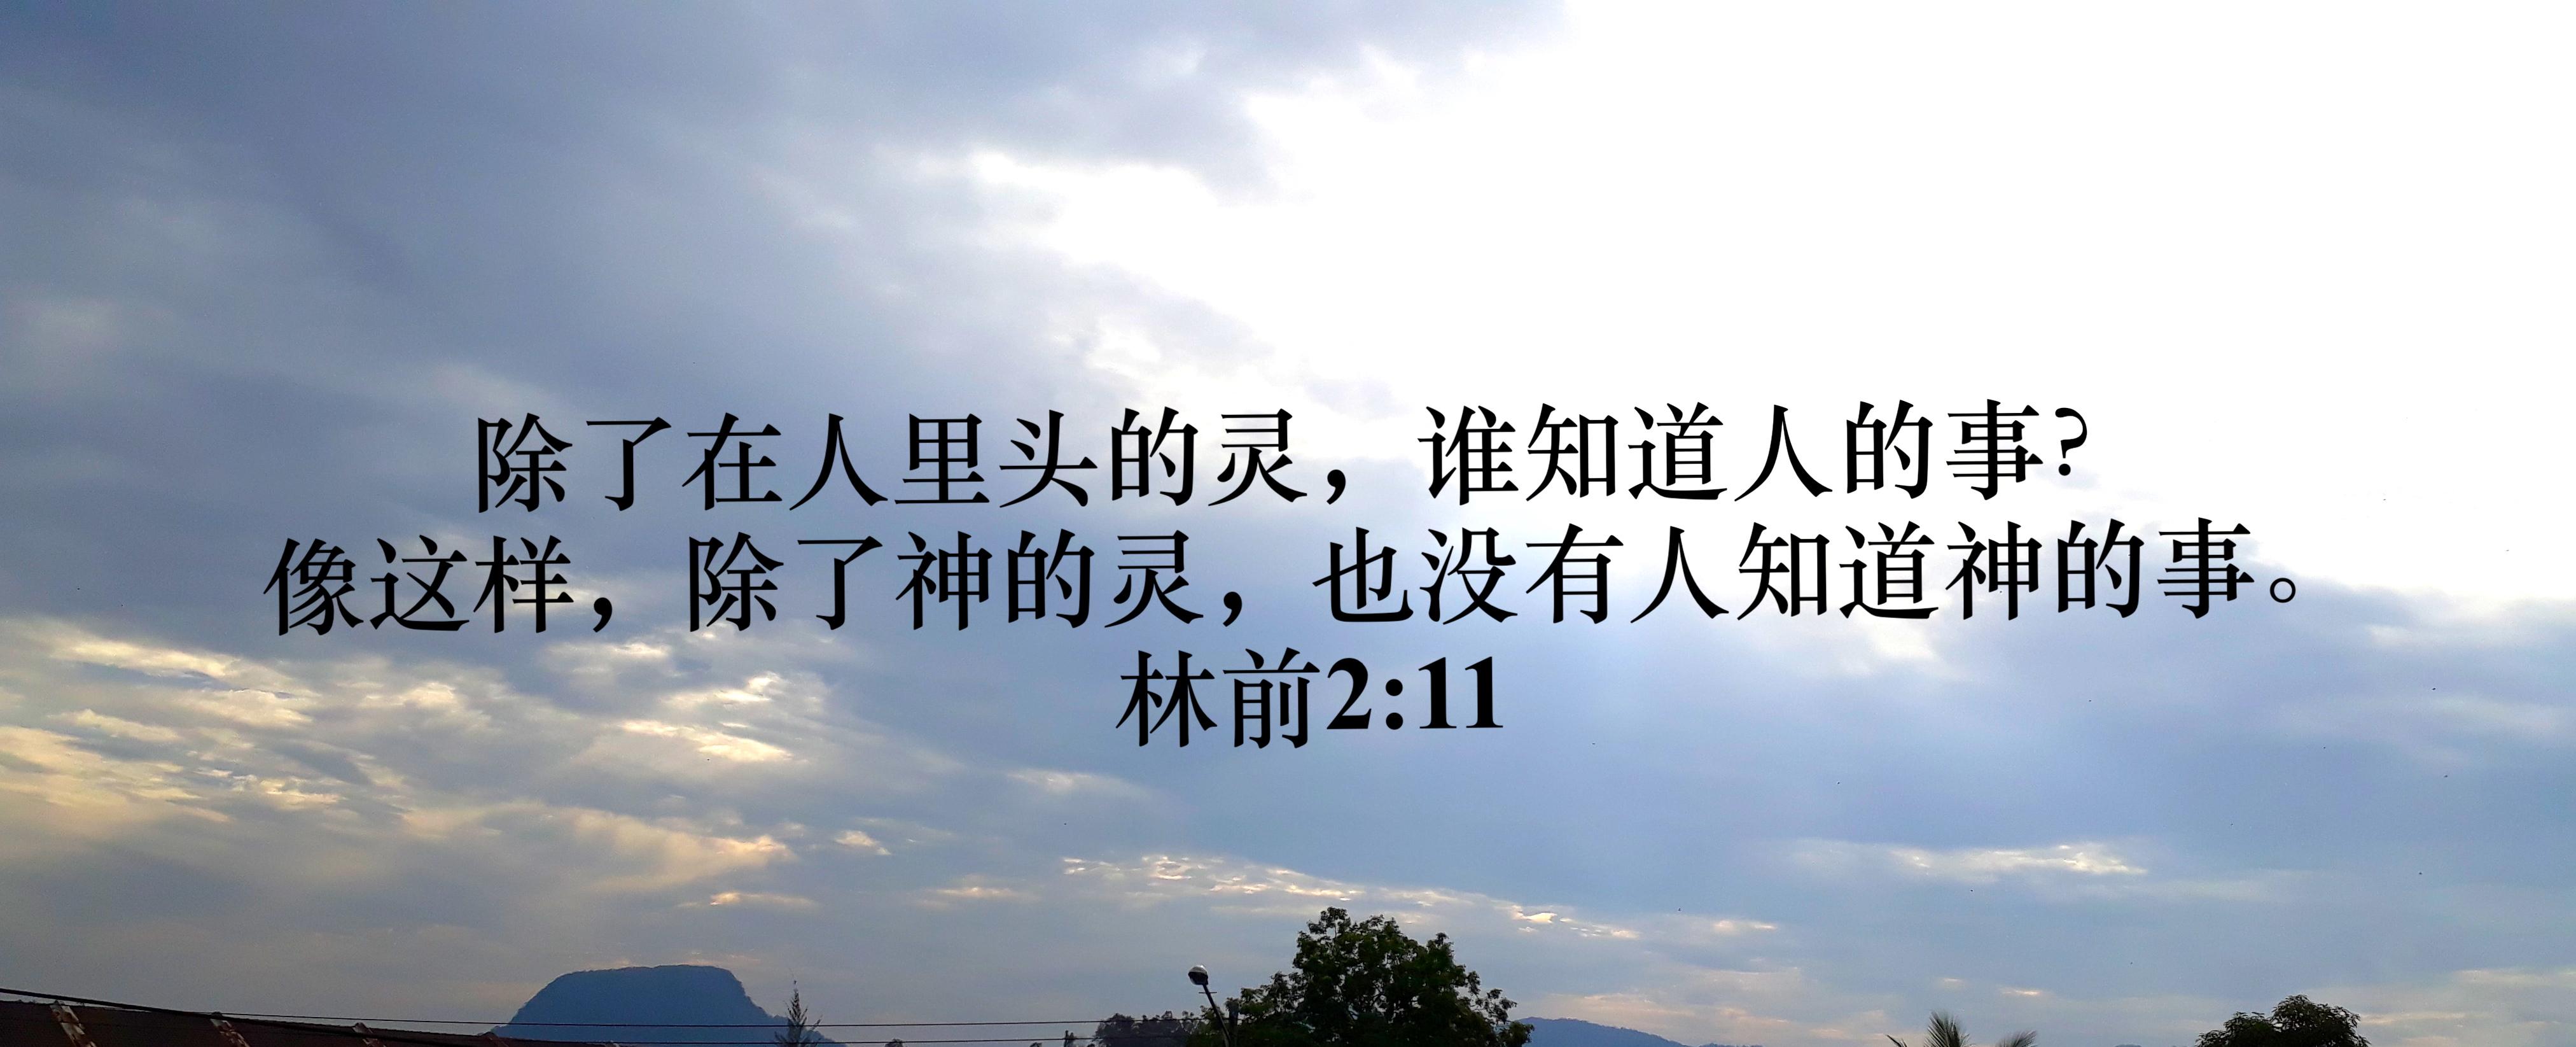 Image result for 我们自己是无法自我重生的,没有任何人能自我重生﹐虽然他听了和接受了神的话﹔圣灵借上帝的话得着人心。这些事通常是在听道的人重生之前发生。